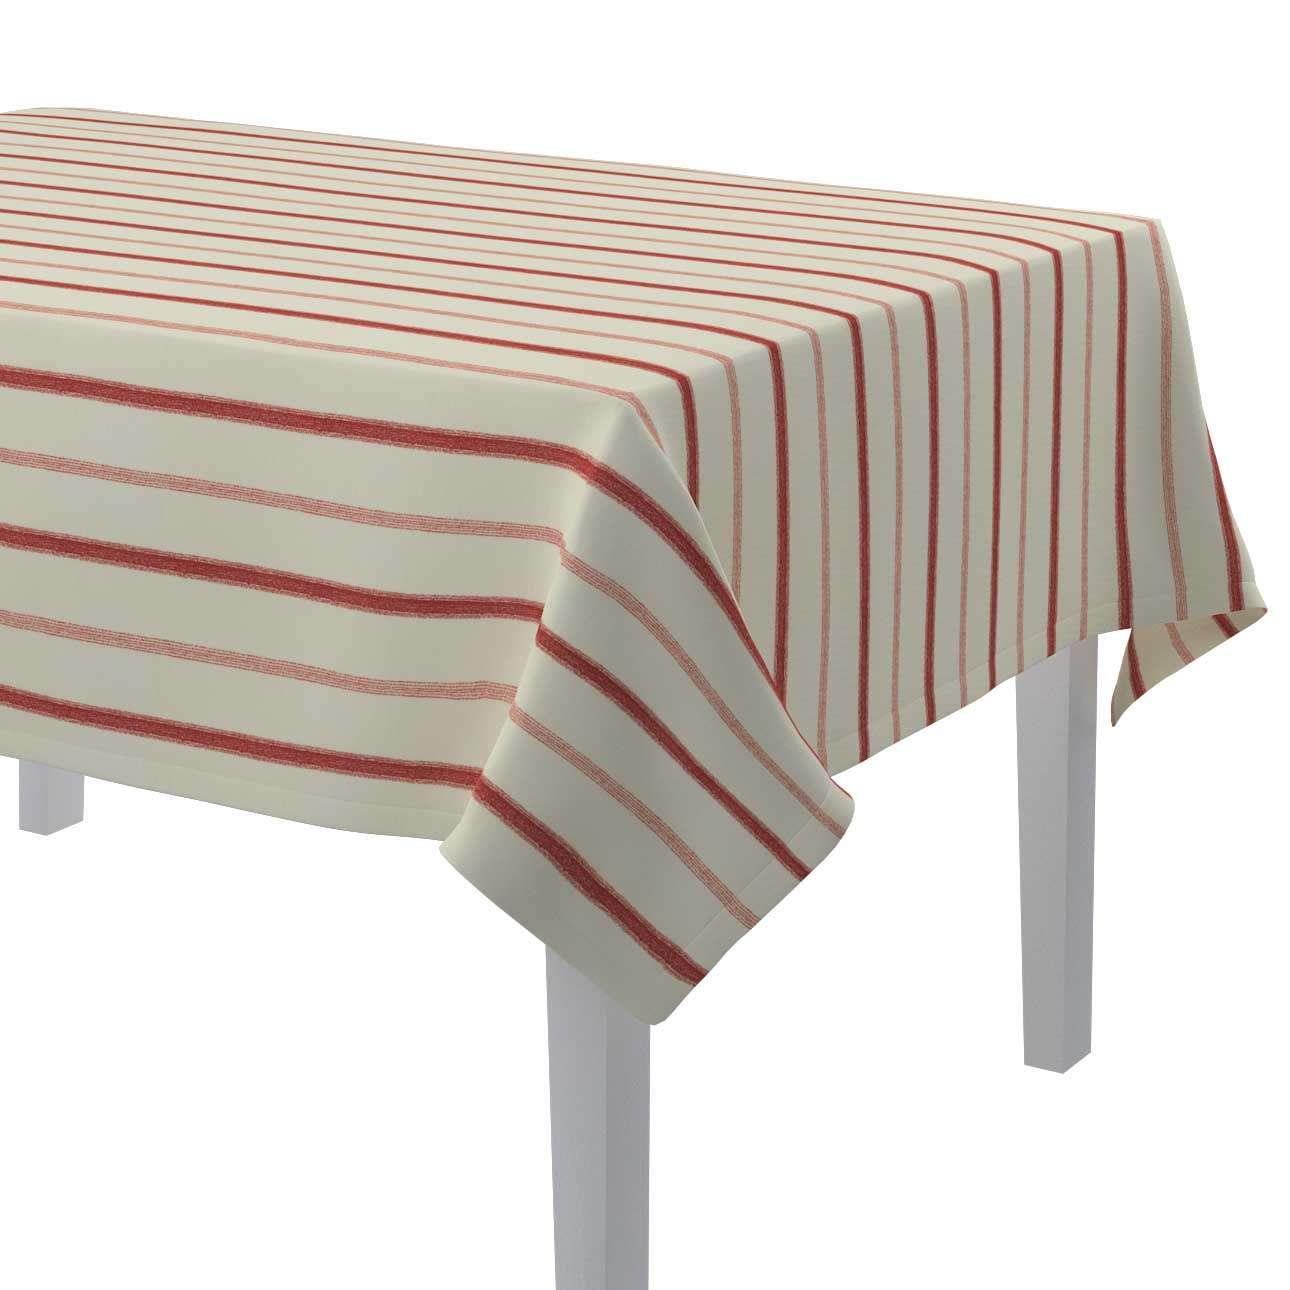 Rectangular tablecloth in collection Avinon, fabric: 129-15